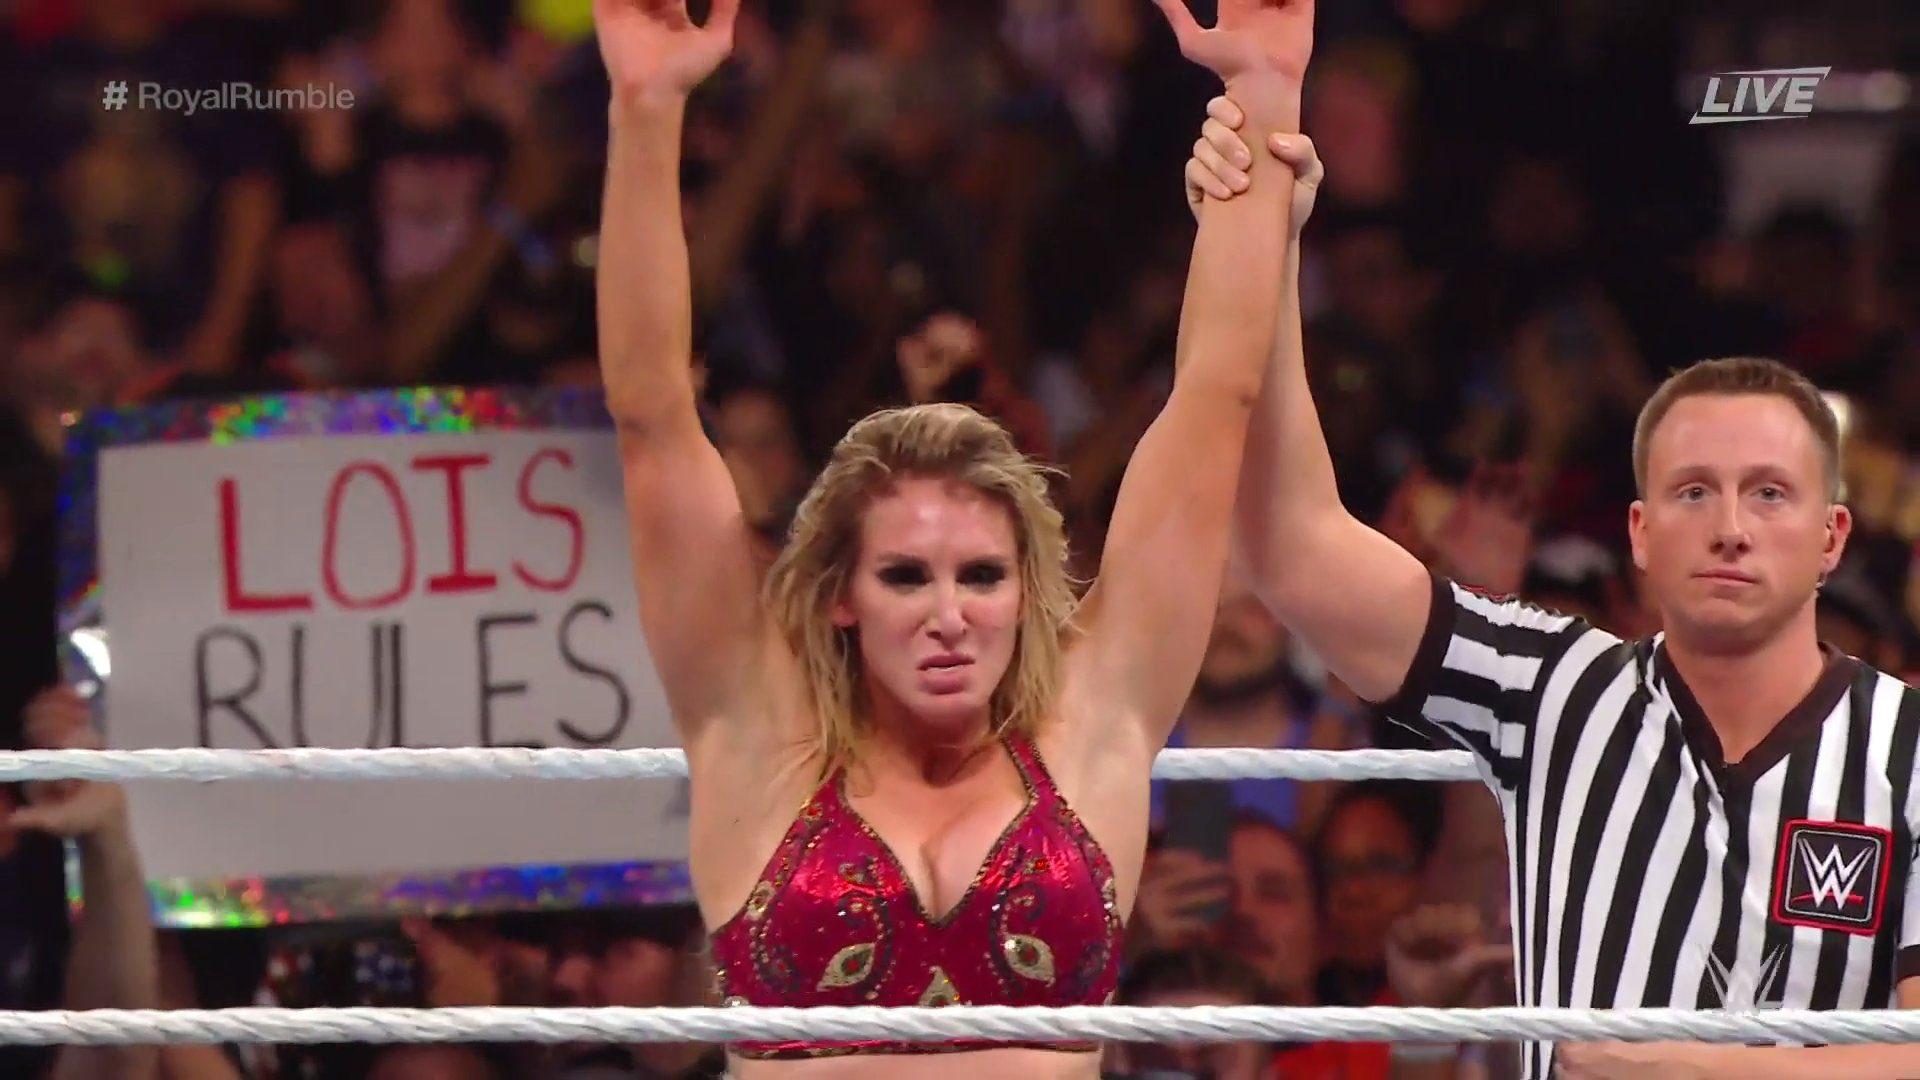 ¡Charlotte Flair ganó el Royal Rumble femenil! 1